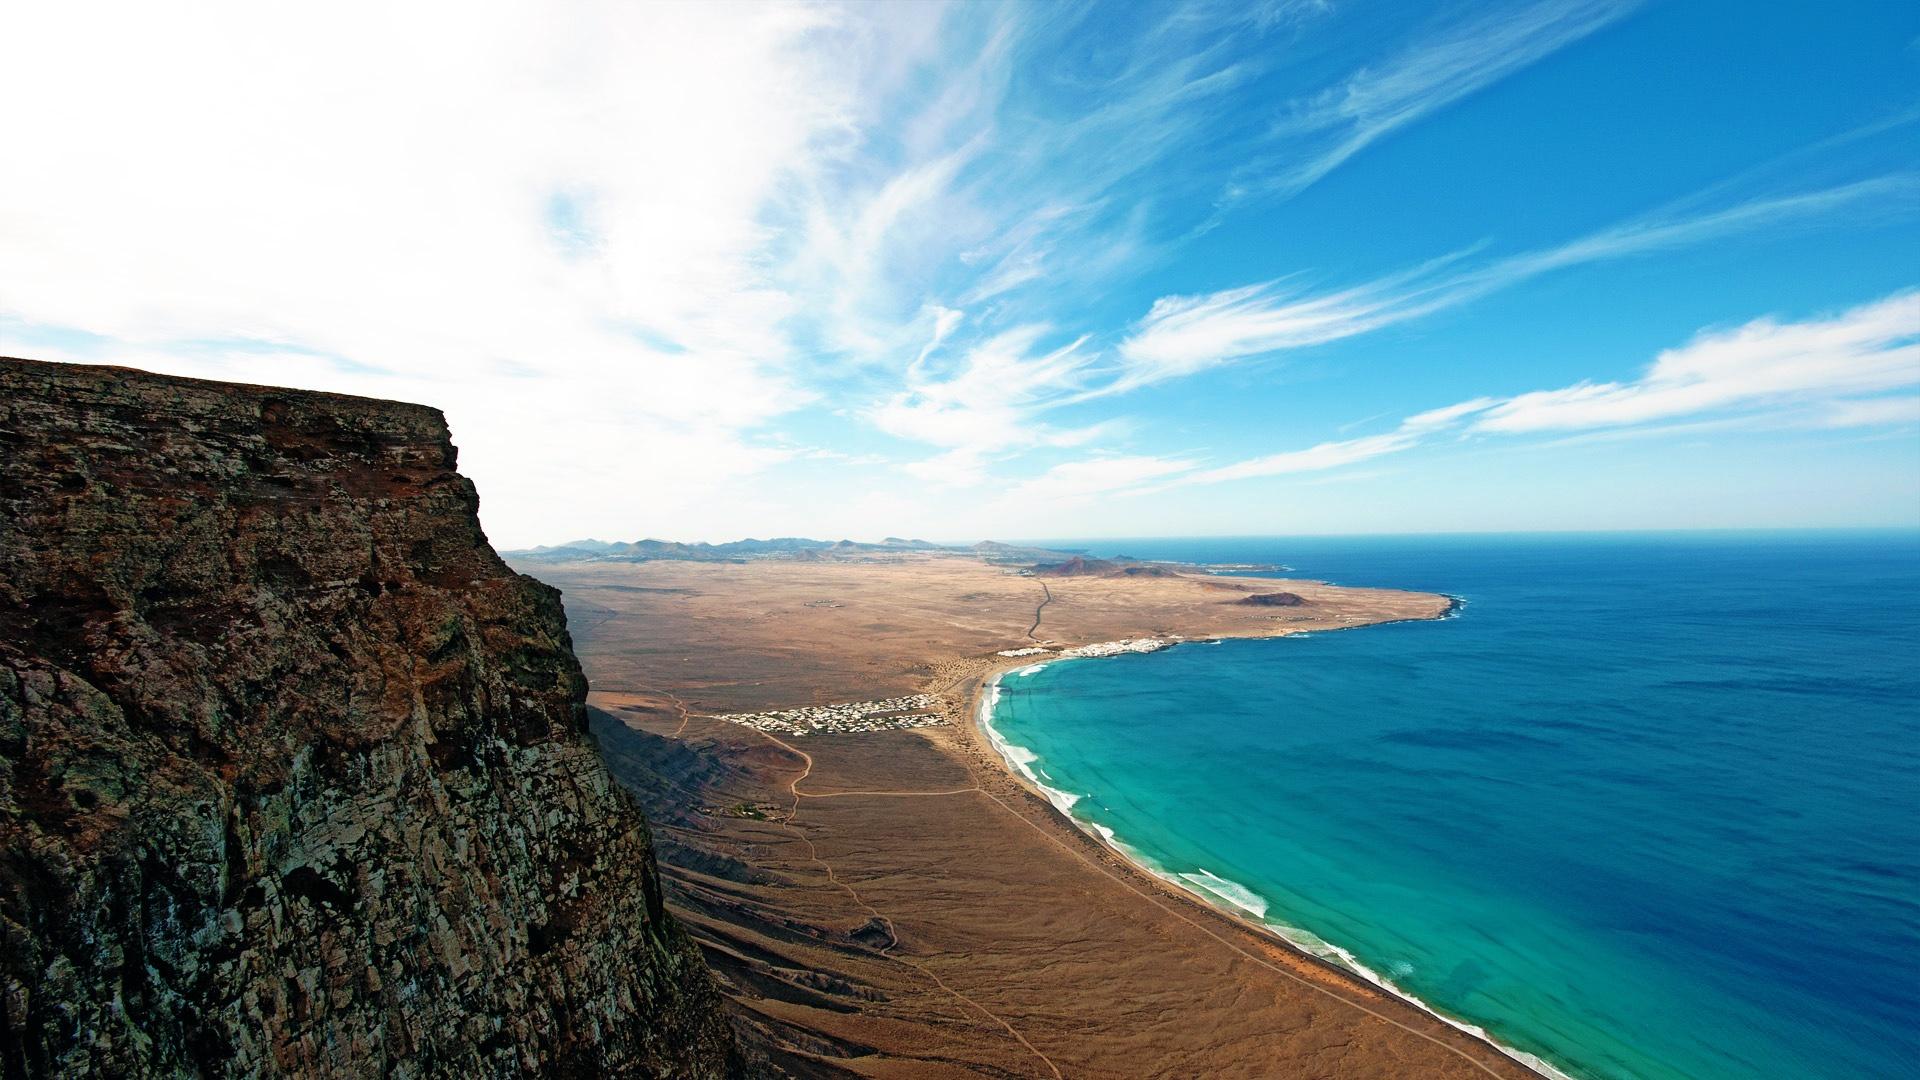 Description Download Lanzarote Island HD Widescreen Beach Wallpaper 1920x1080